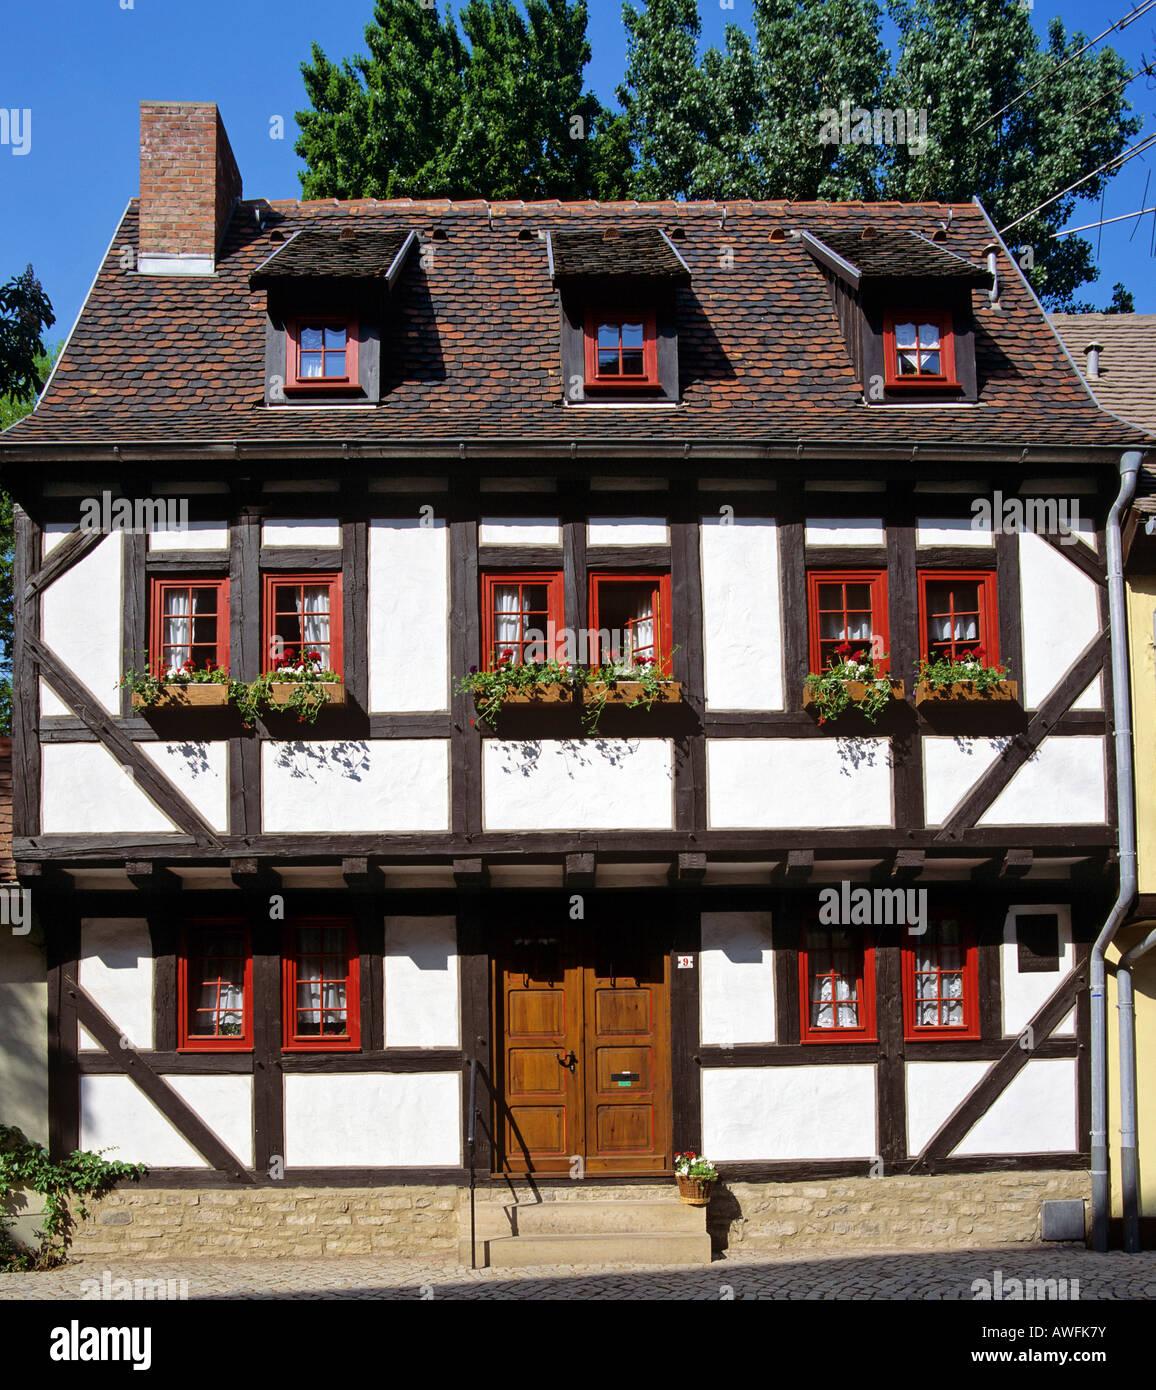 Fachwerk-style house in Erfurt, Thuringia, Germany, Europe - Stock Image